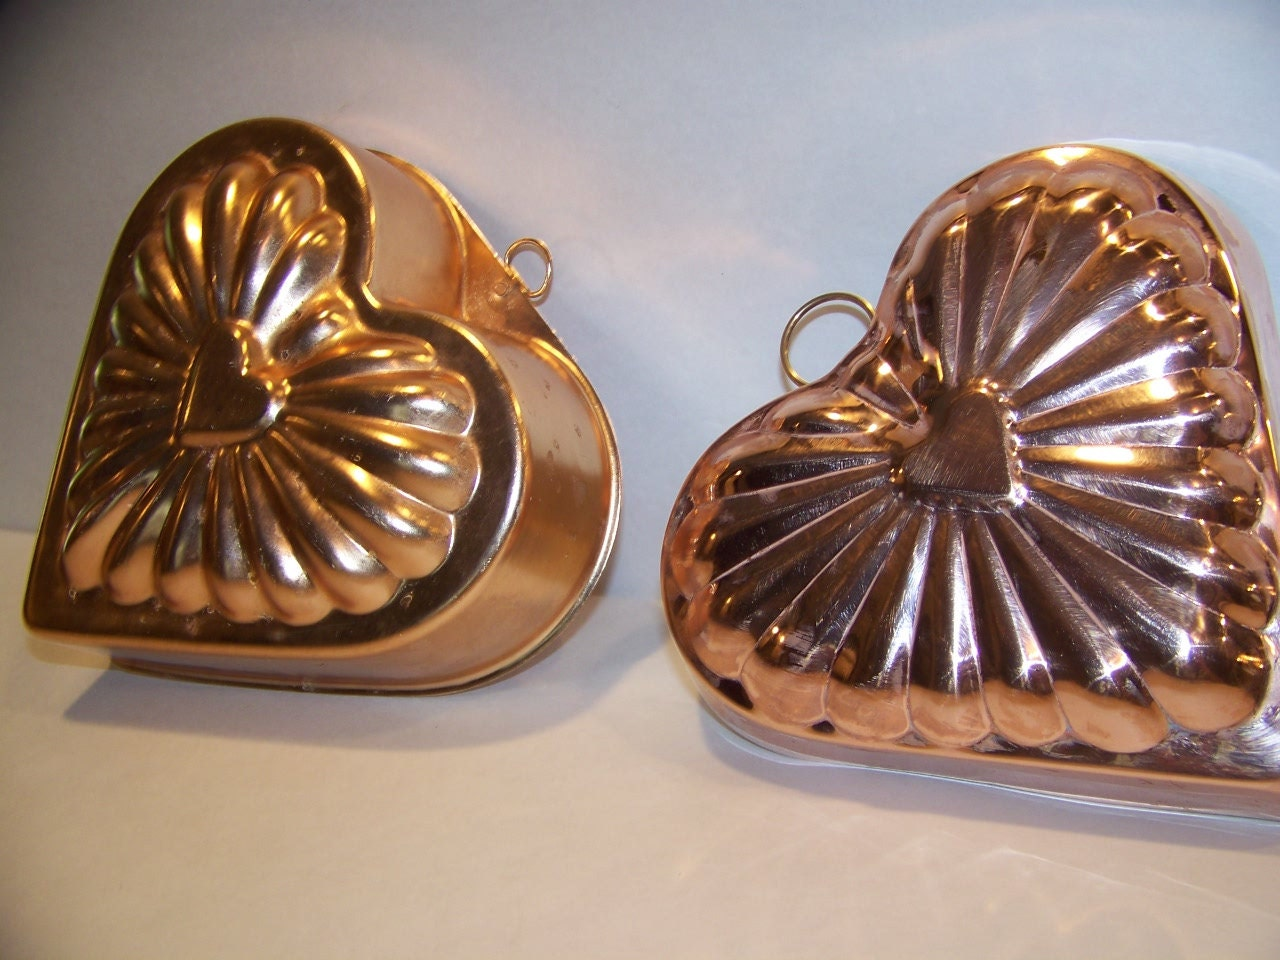 copper gelatin molds